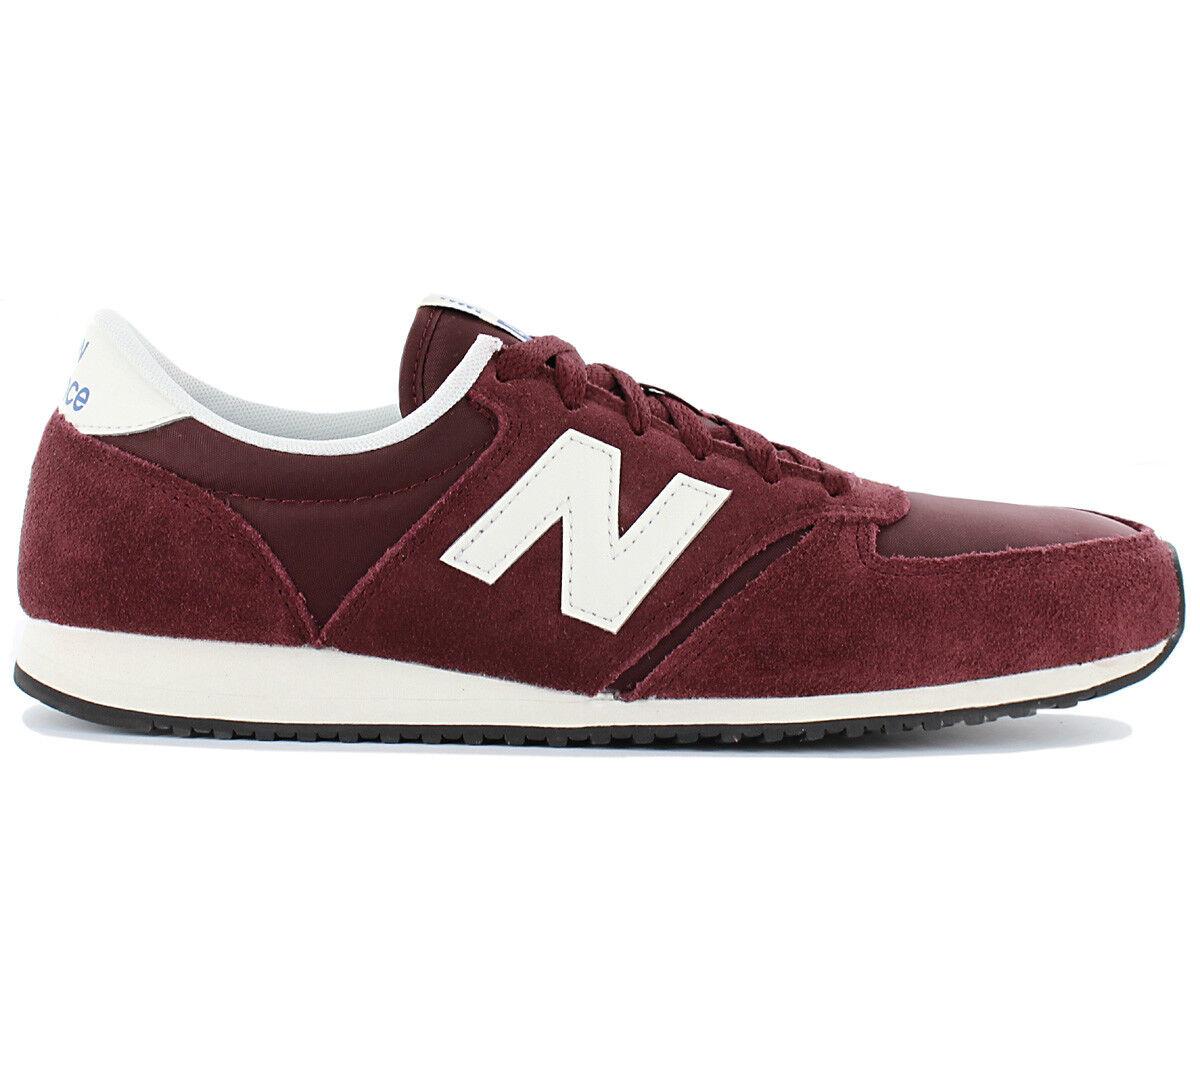 New Balance Classics 420 Sneaker Scarpe Uomo Casual da Ginnastica U420RDW Nuovo